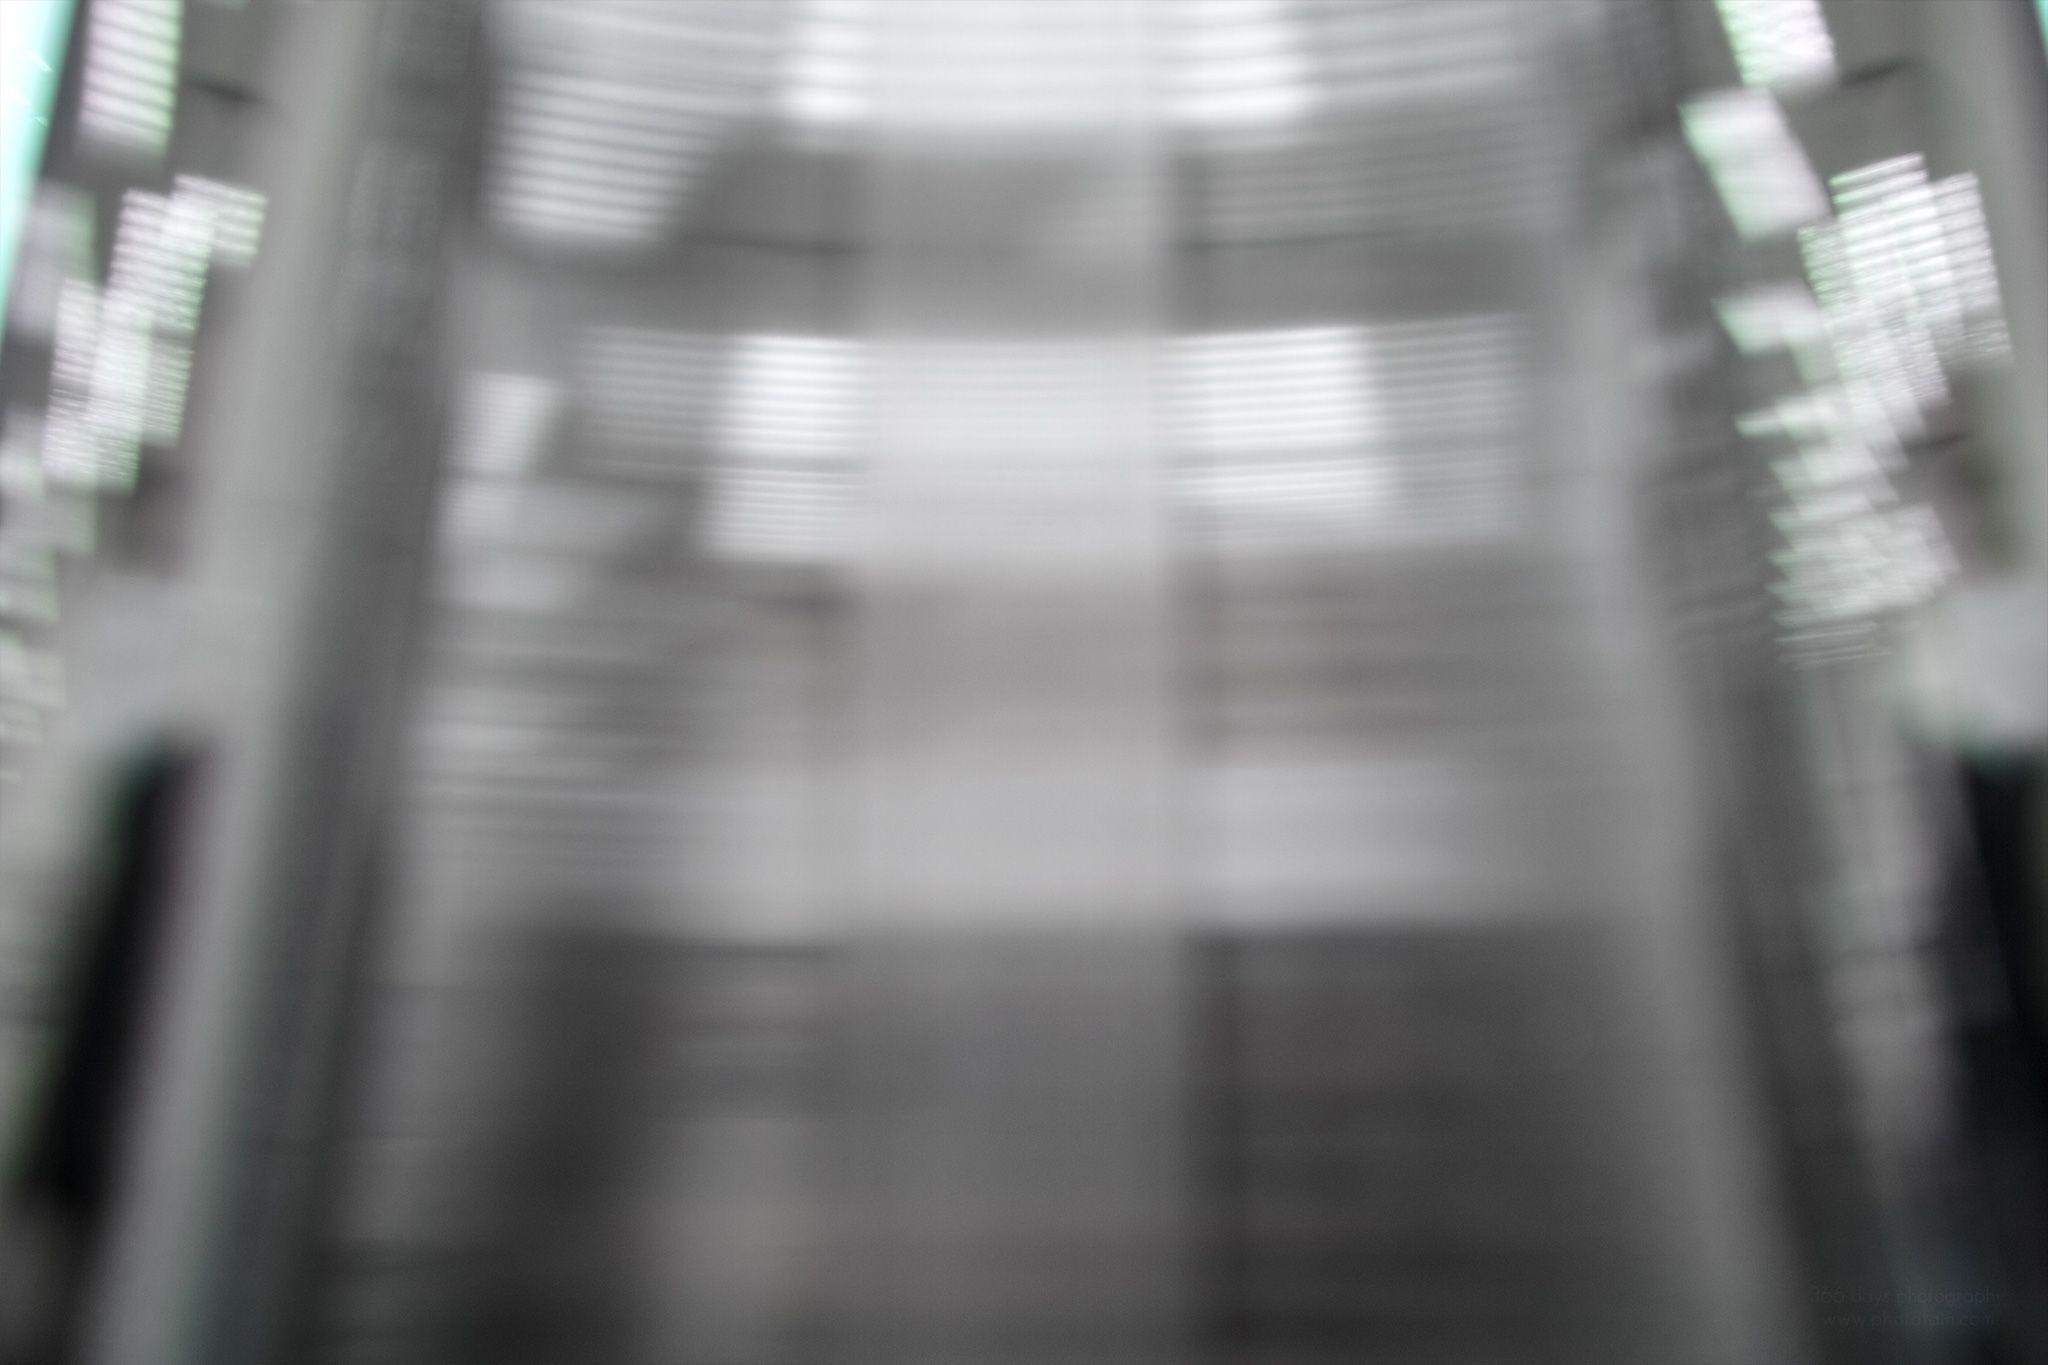 348/366 days photography season 7